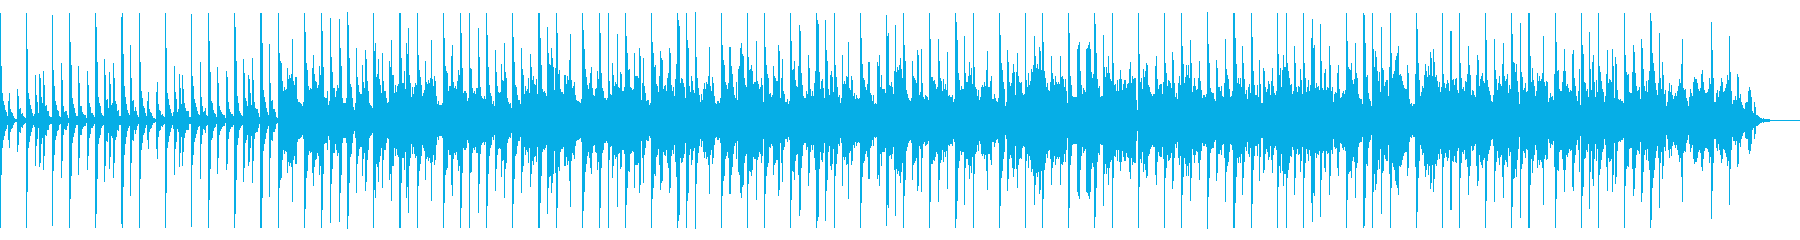 KANTアフリカンテイストBGM2017の再生済みの波形